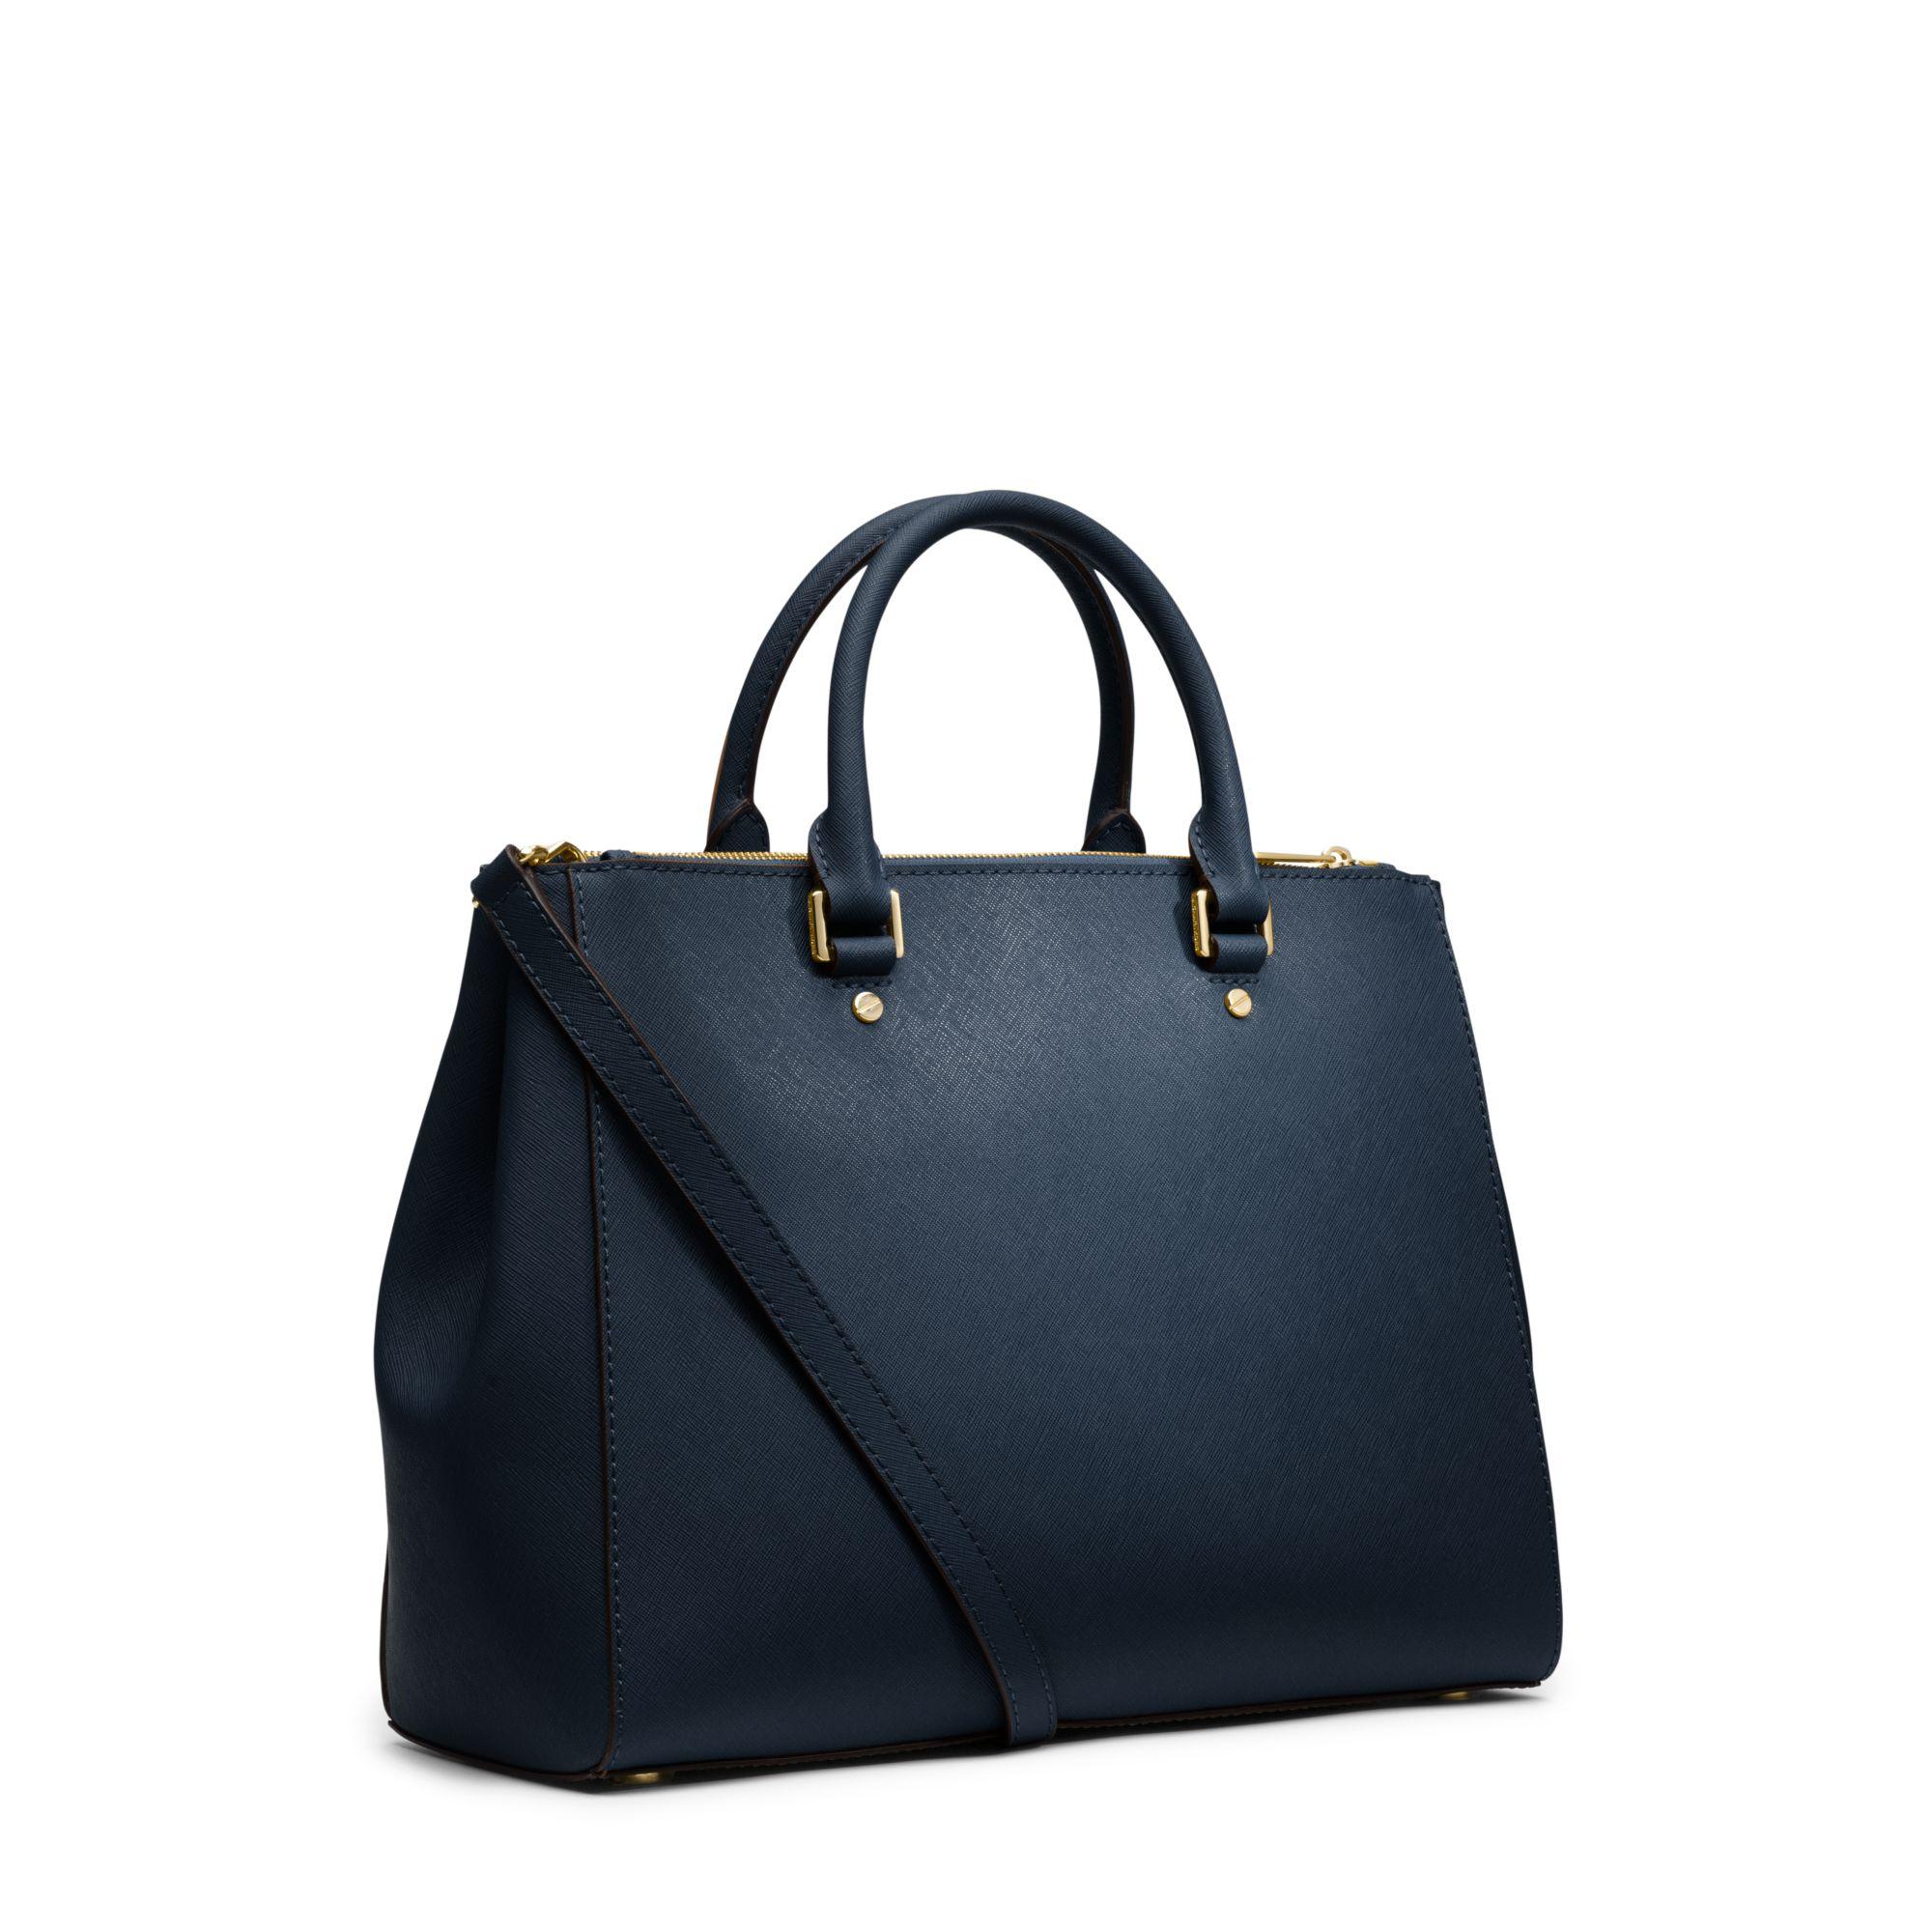 Michael kors Sutton Saffiano Leather Large Satchel in Blue ...